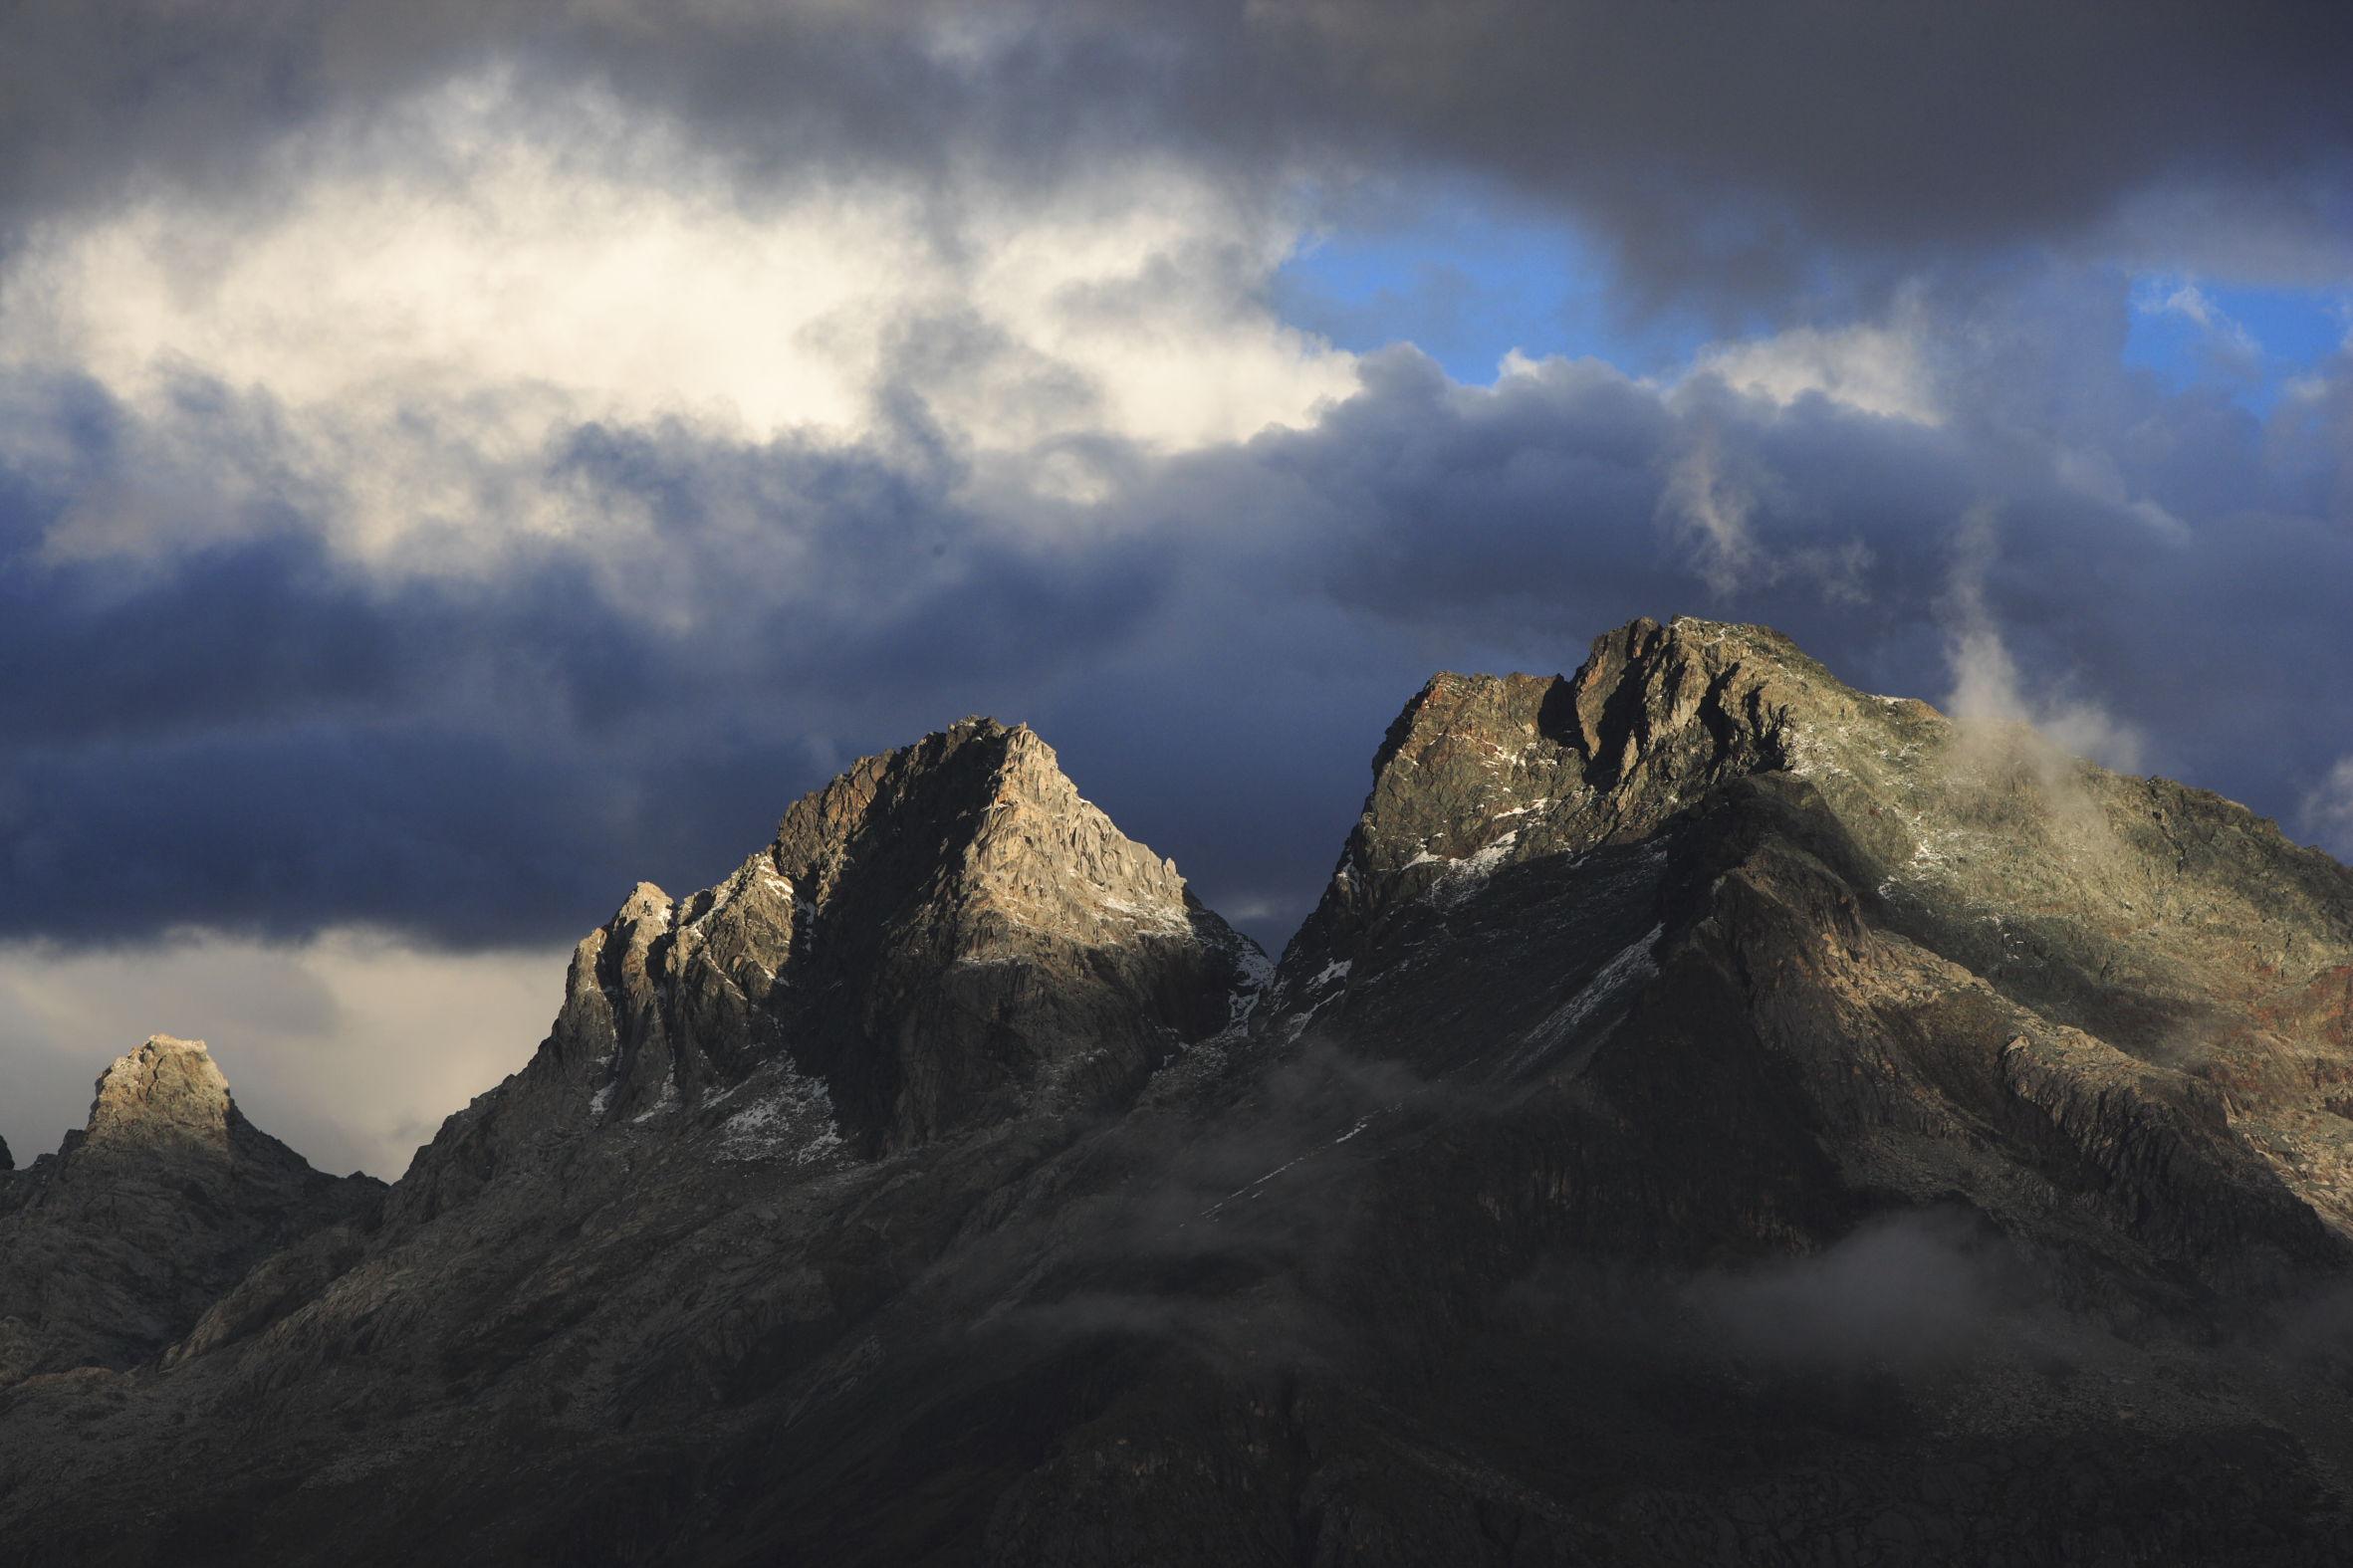 Sommets du Chopicalqui La cordillère blanche (Cordillera Blanca) Andes PEROU